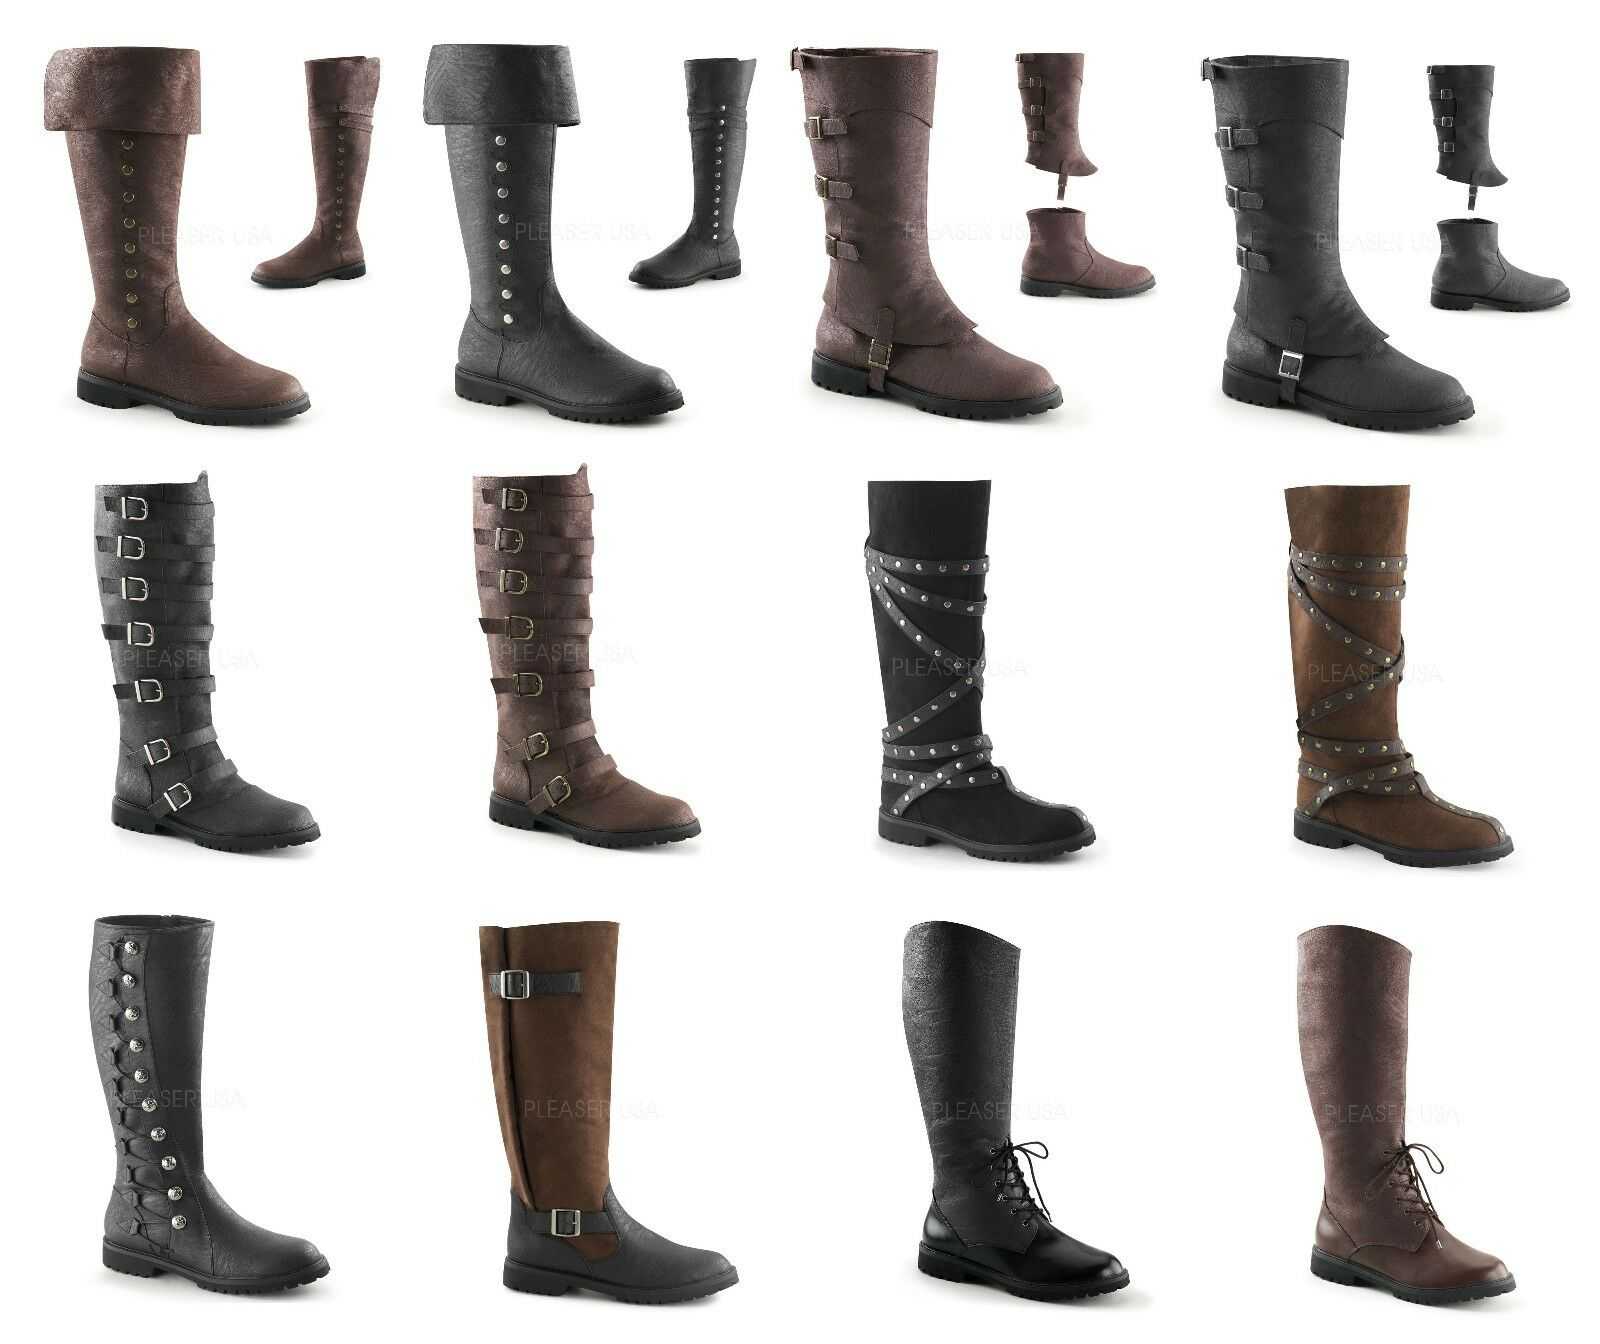 Pleaser Funtasma GOTHAM  Men's Flat Heel Tirare -on Gine High stivali 13 Styles  clienti prima reputazione prima